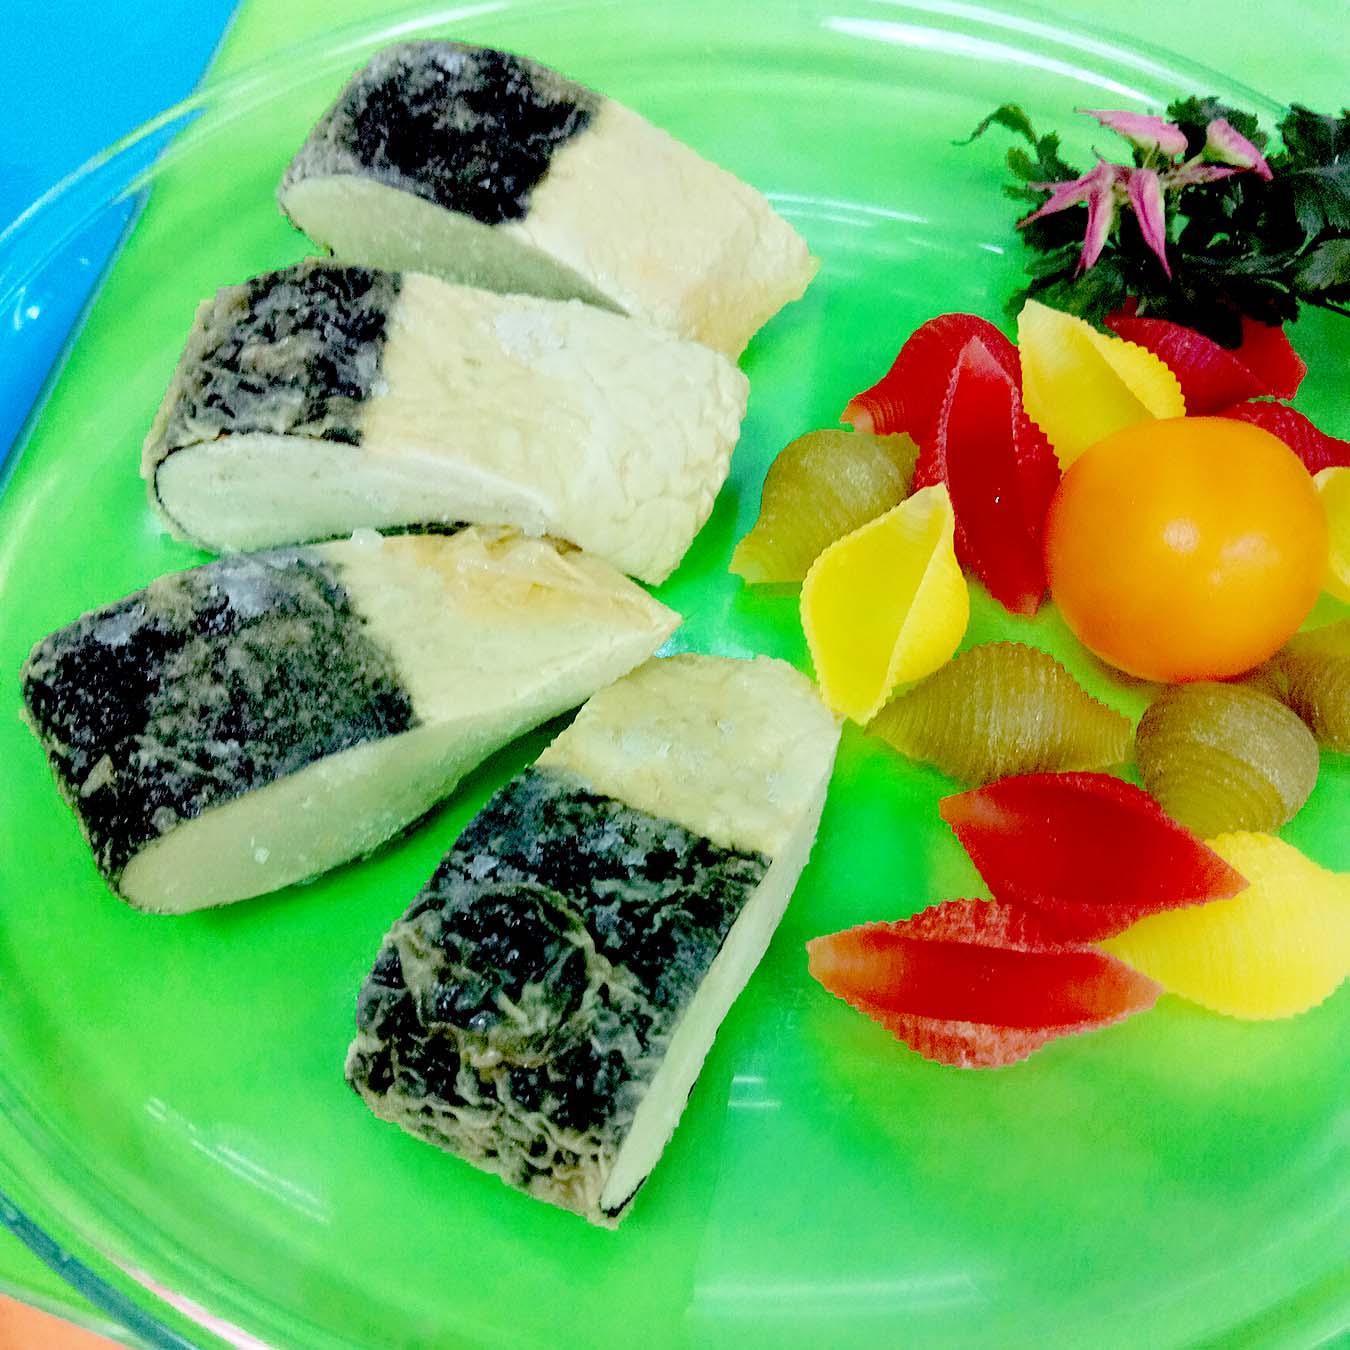 Image Vegefarm Ribbon Fish 松珍-白带鱼 454grams